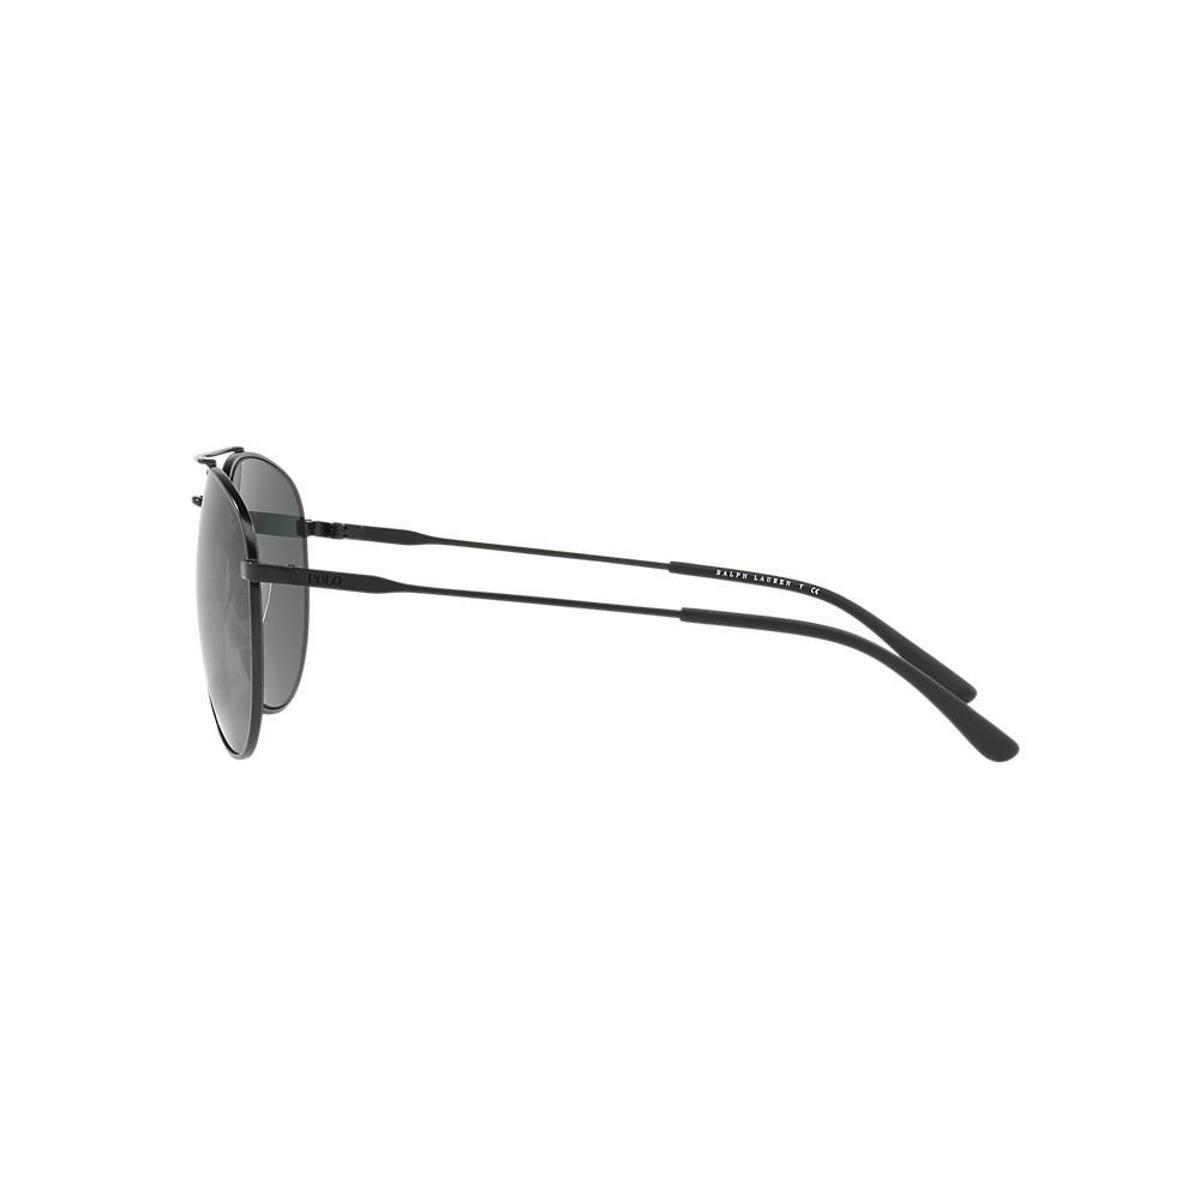 Óculos de Sol Polo Ralph Lauren Piloto PH3111 Masculino - Compre ... 56aad5aff3